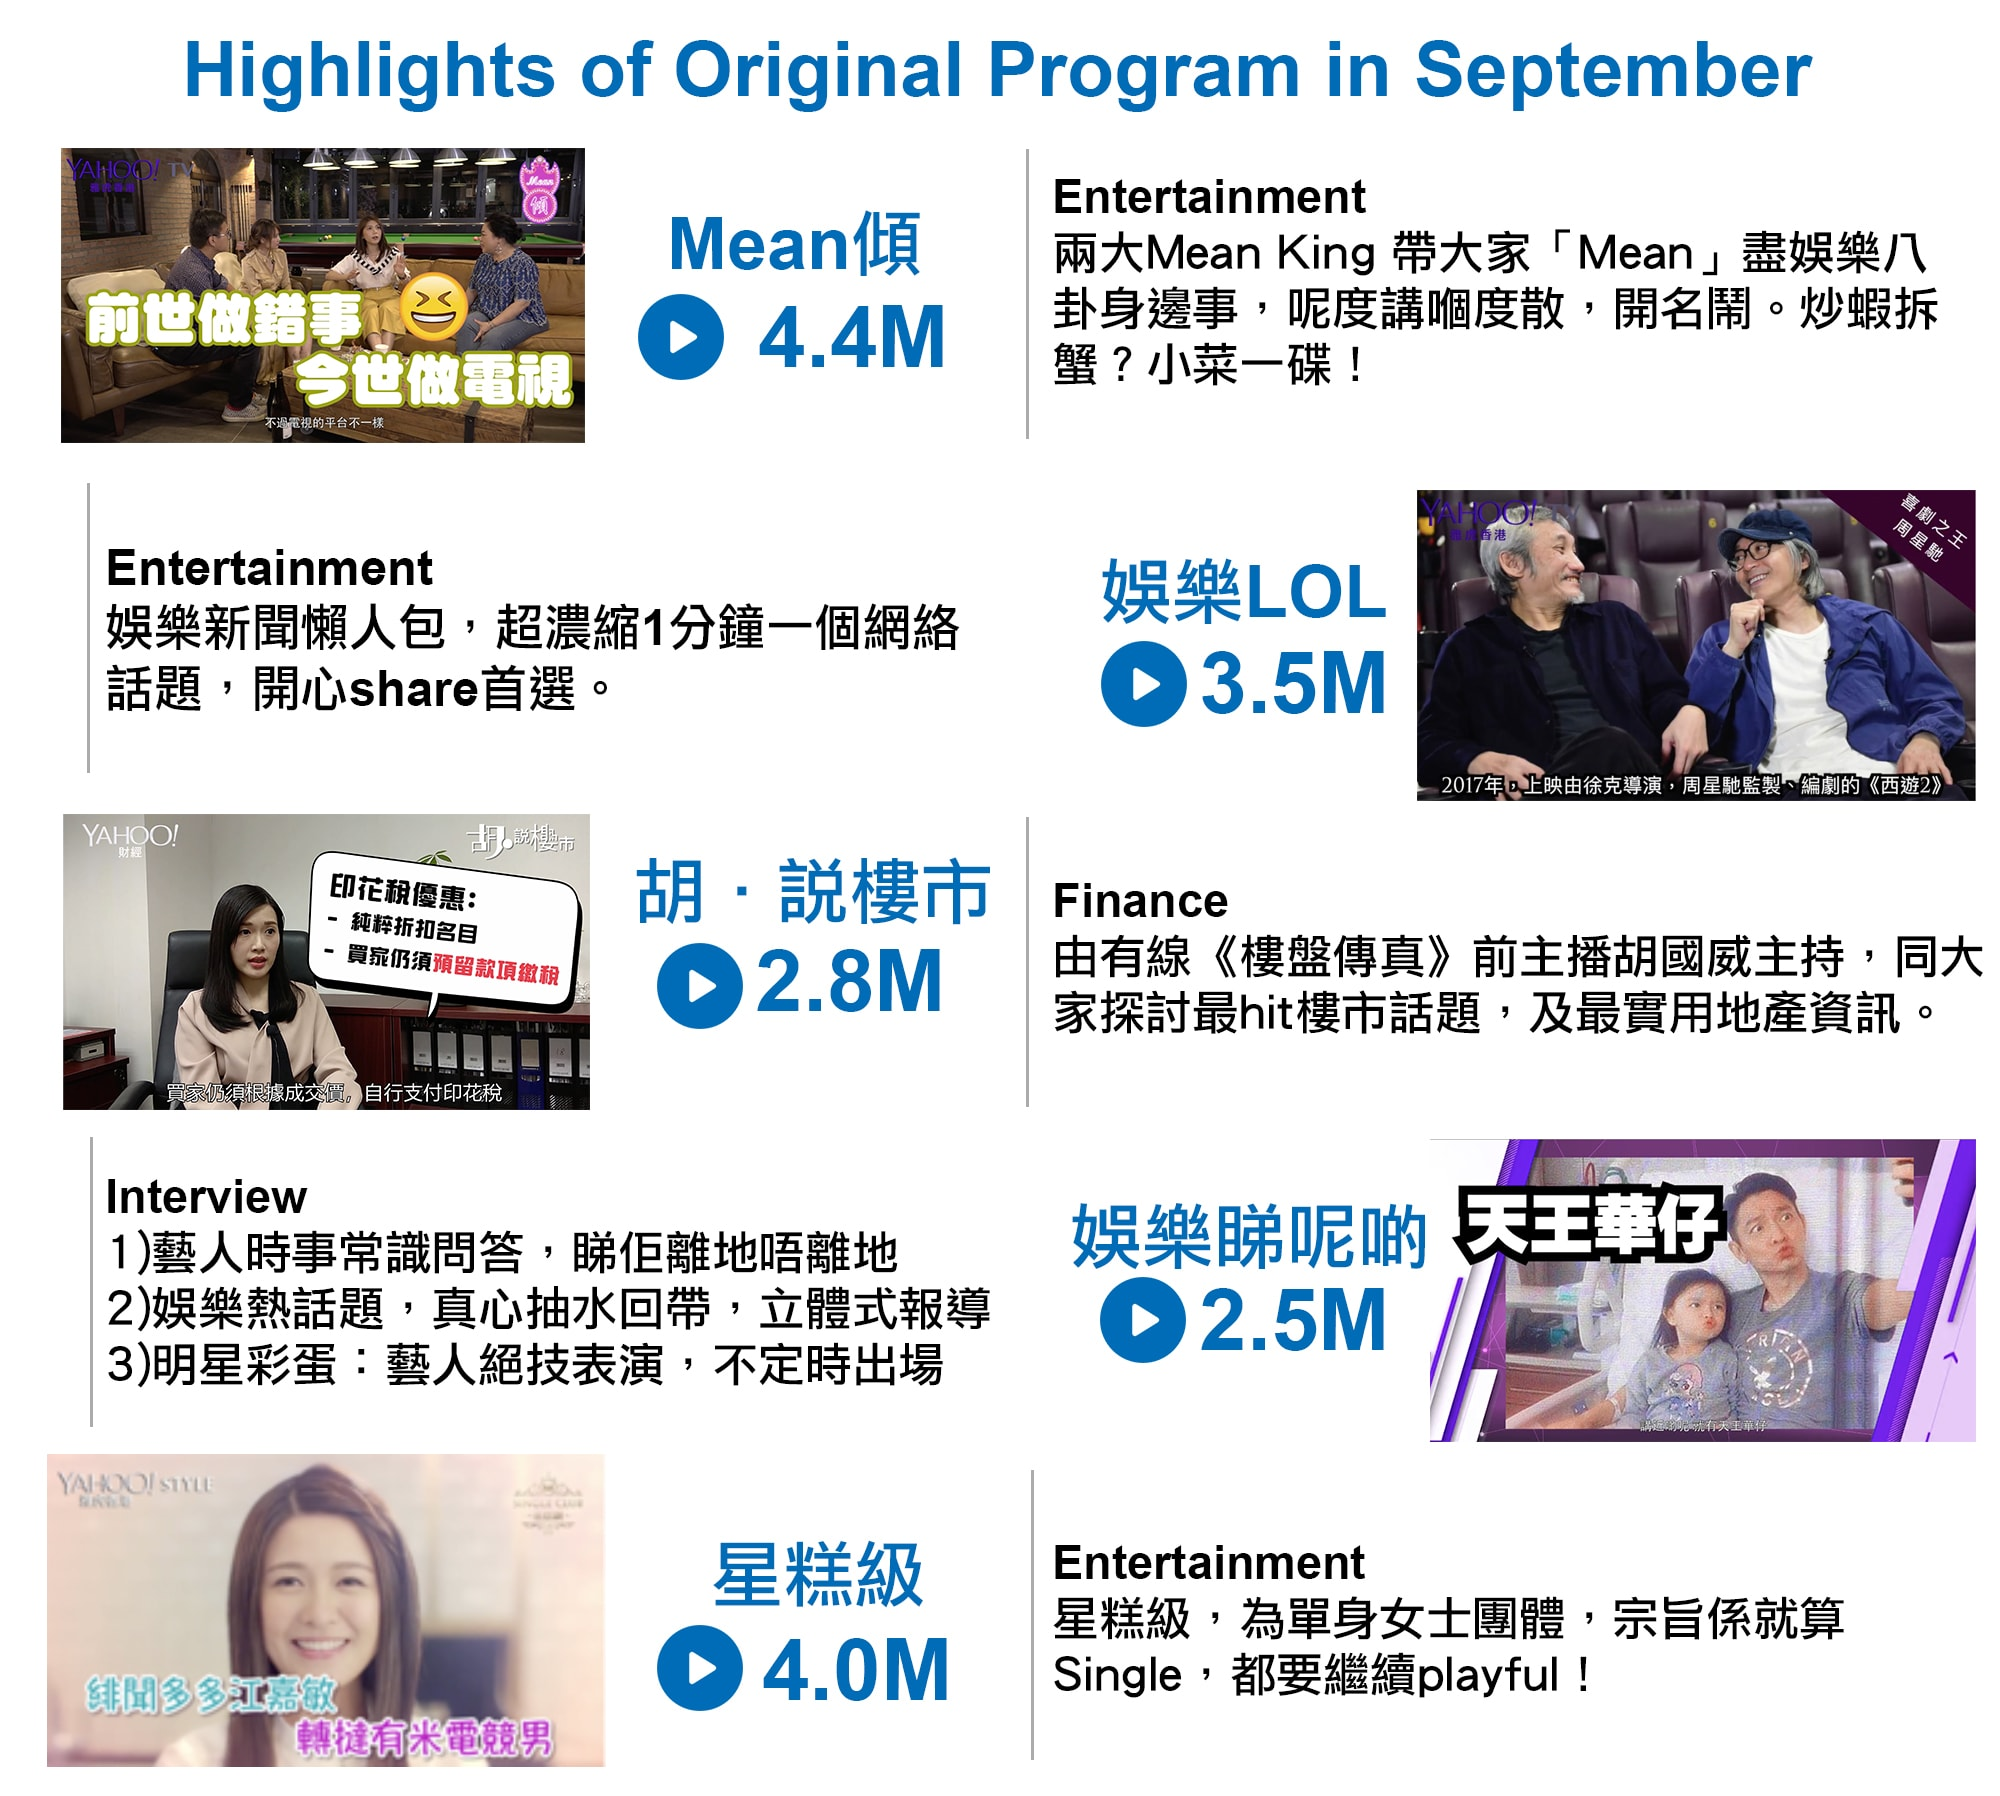 Highlighted Original Programs